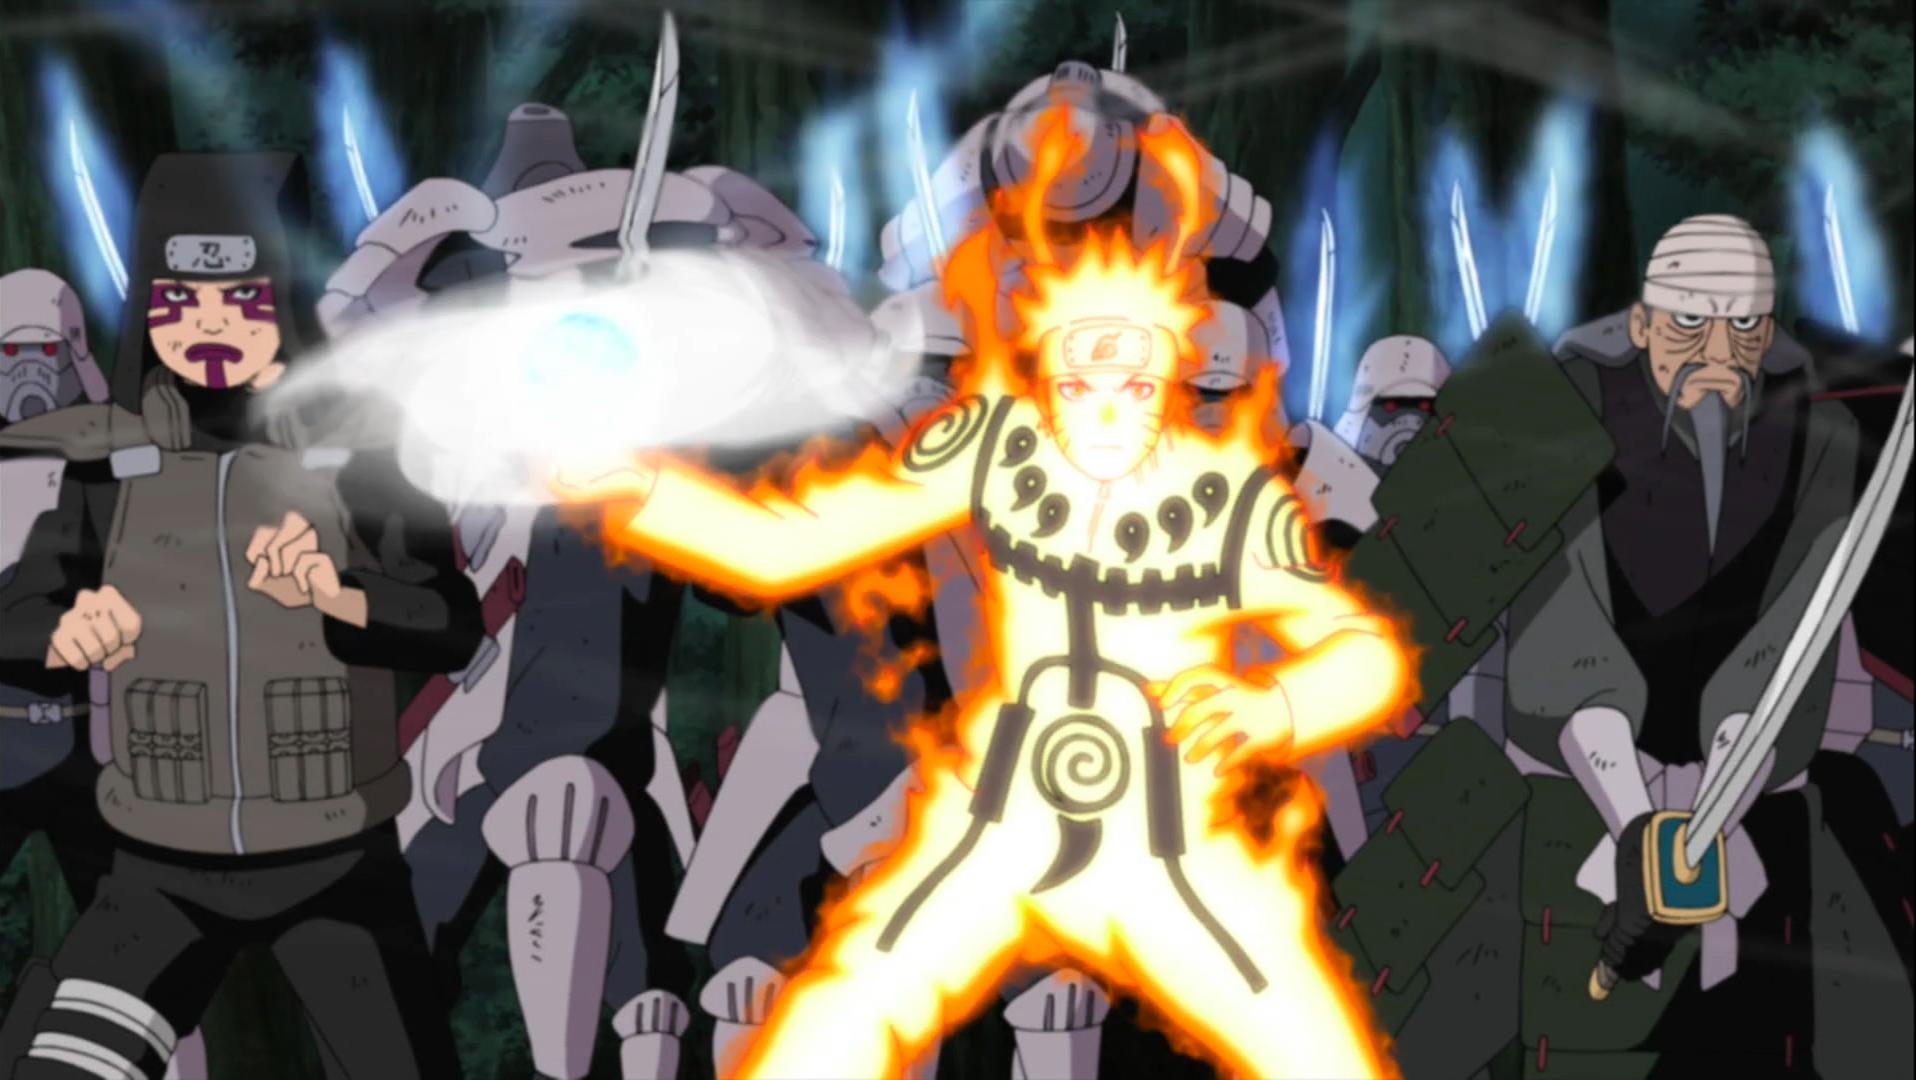 Naruto Kimimaro Sword Related Keywords & Suggestions - Naruto Kimimaro Sword Long Tail Keywords Gaara And Lee Vs Kimimaro Full Fight